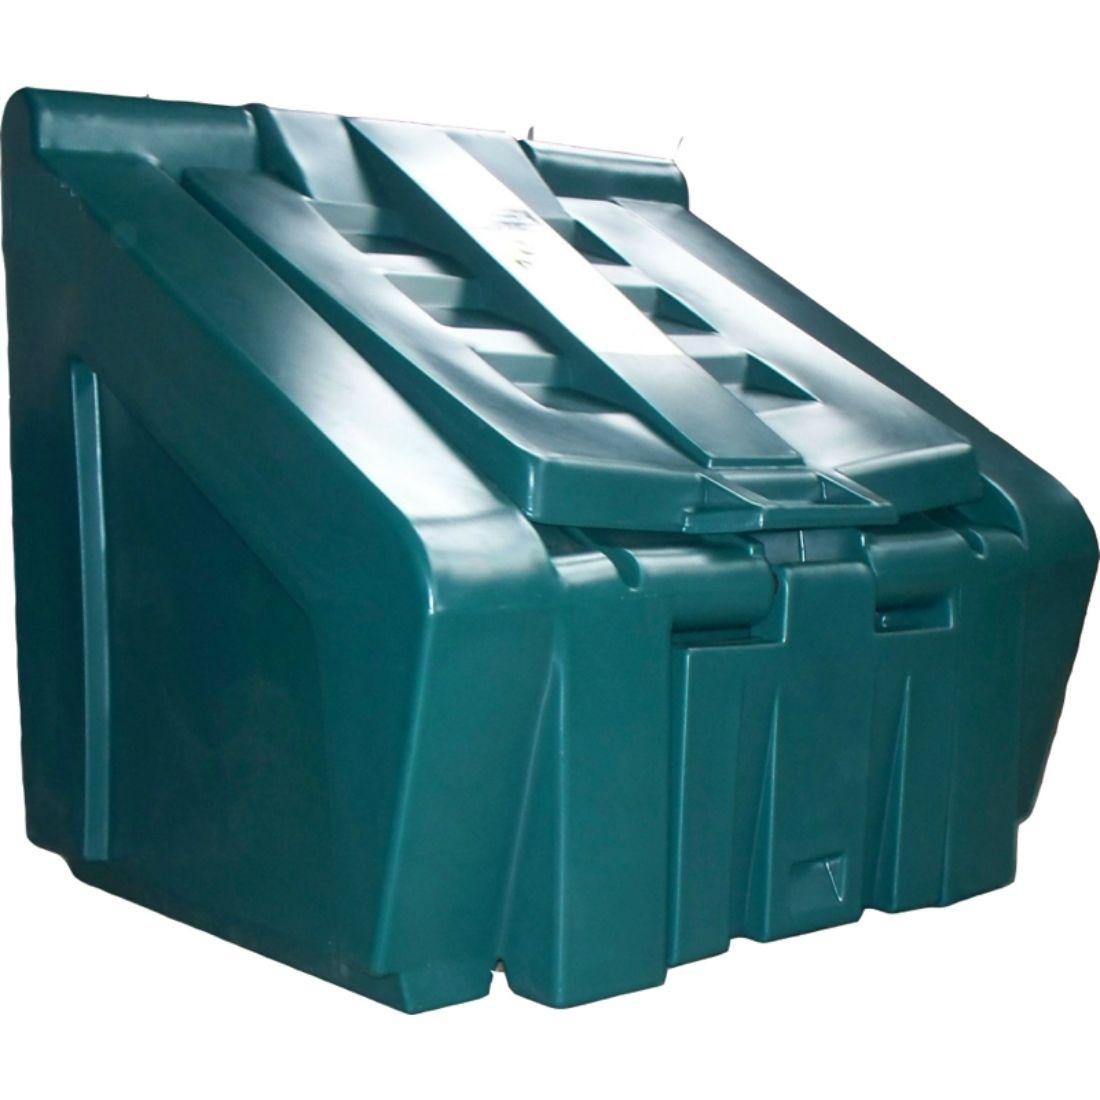 Photograph of Green Carbery 6-bag Coal Bunker